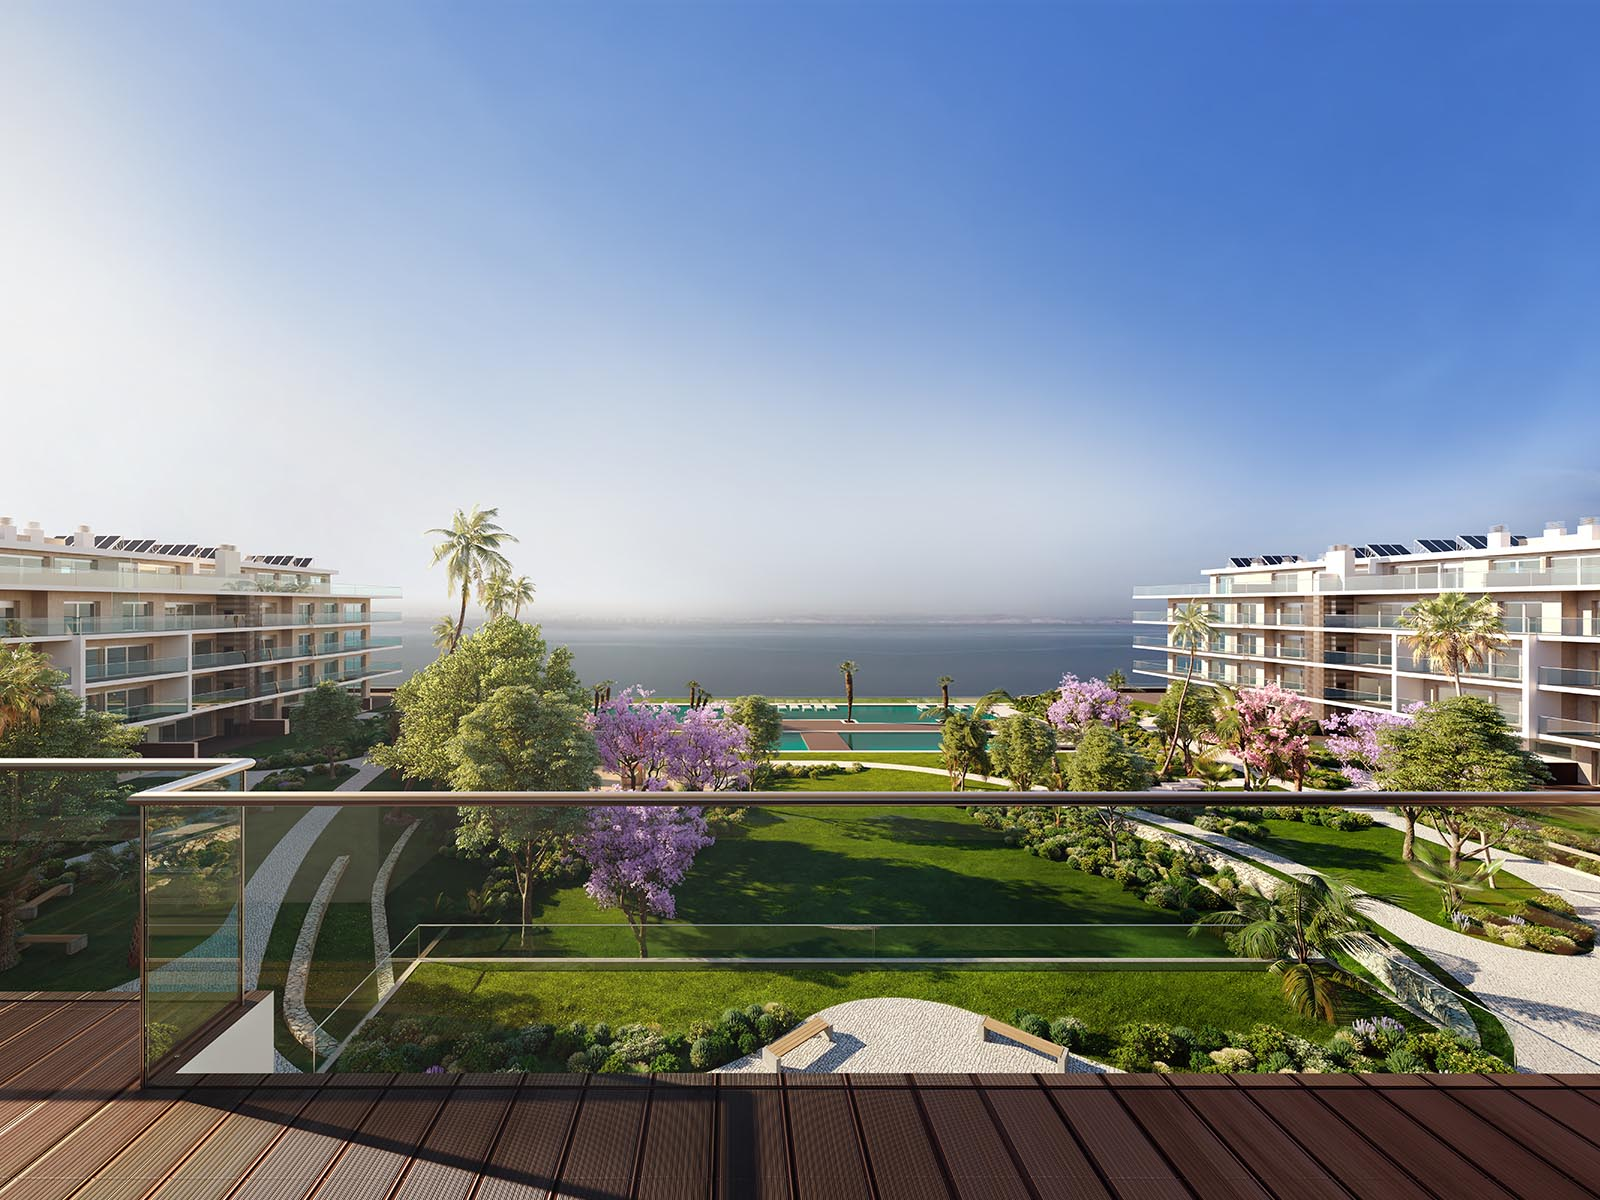 Tagus Bay - Condominio - Portugal